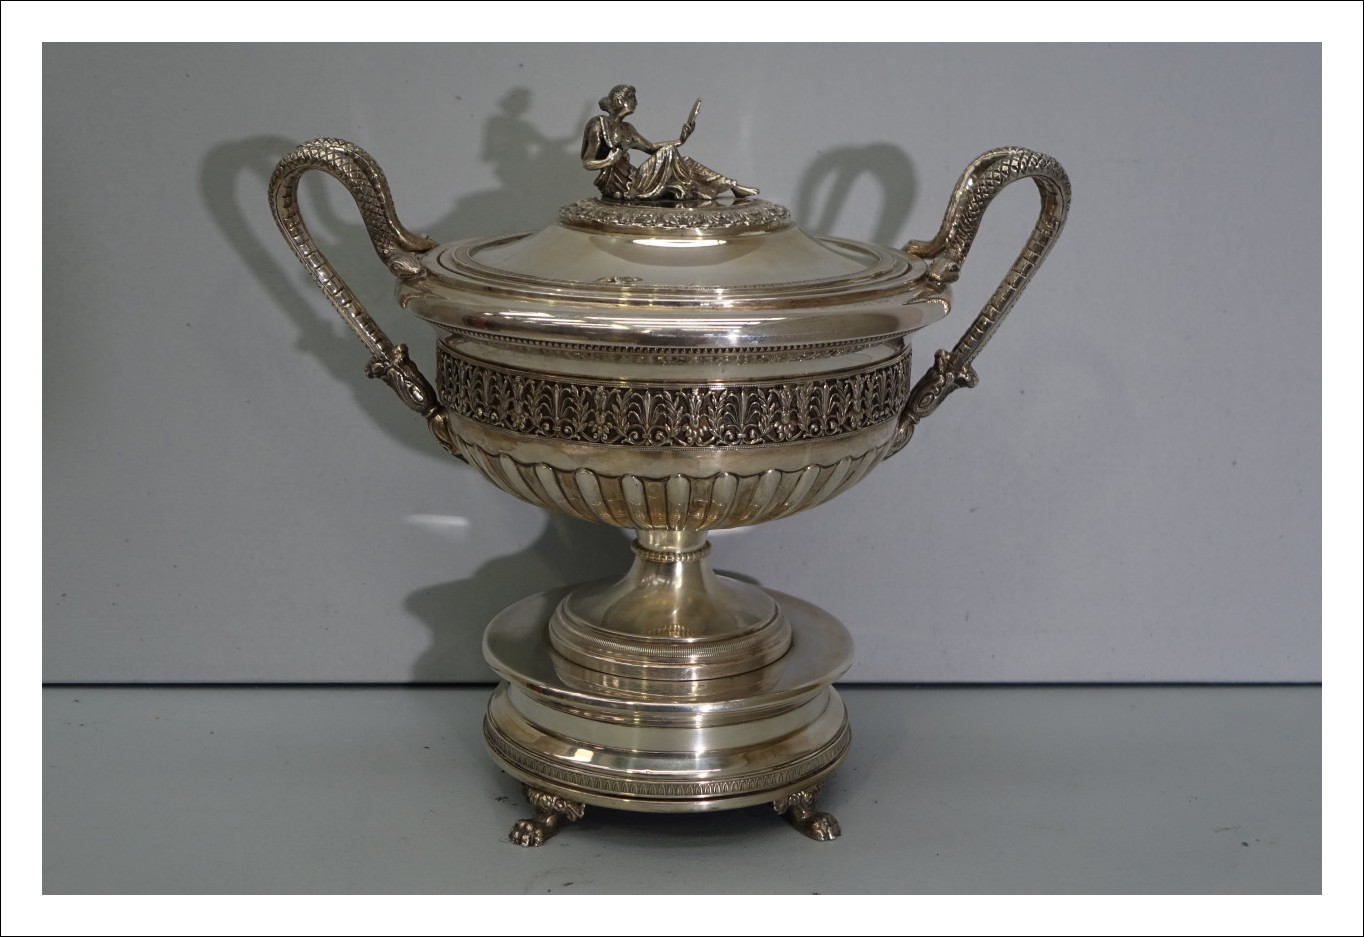 Centrotavola vaso argento punzoni fascio littorio 1932 Milano